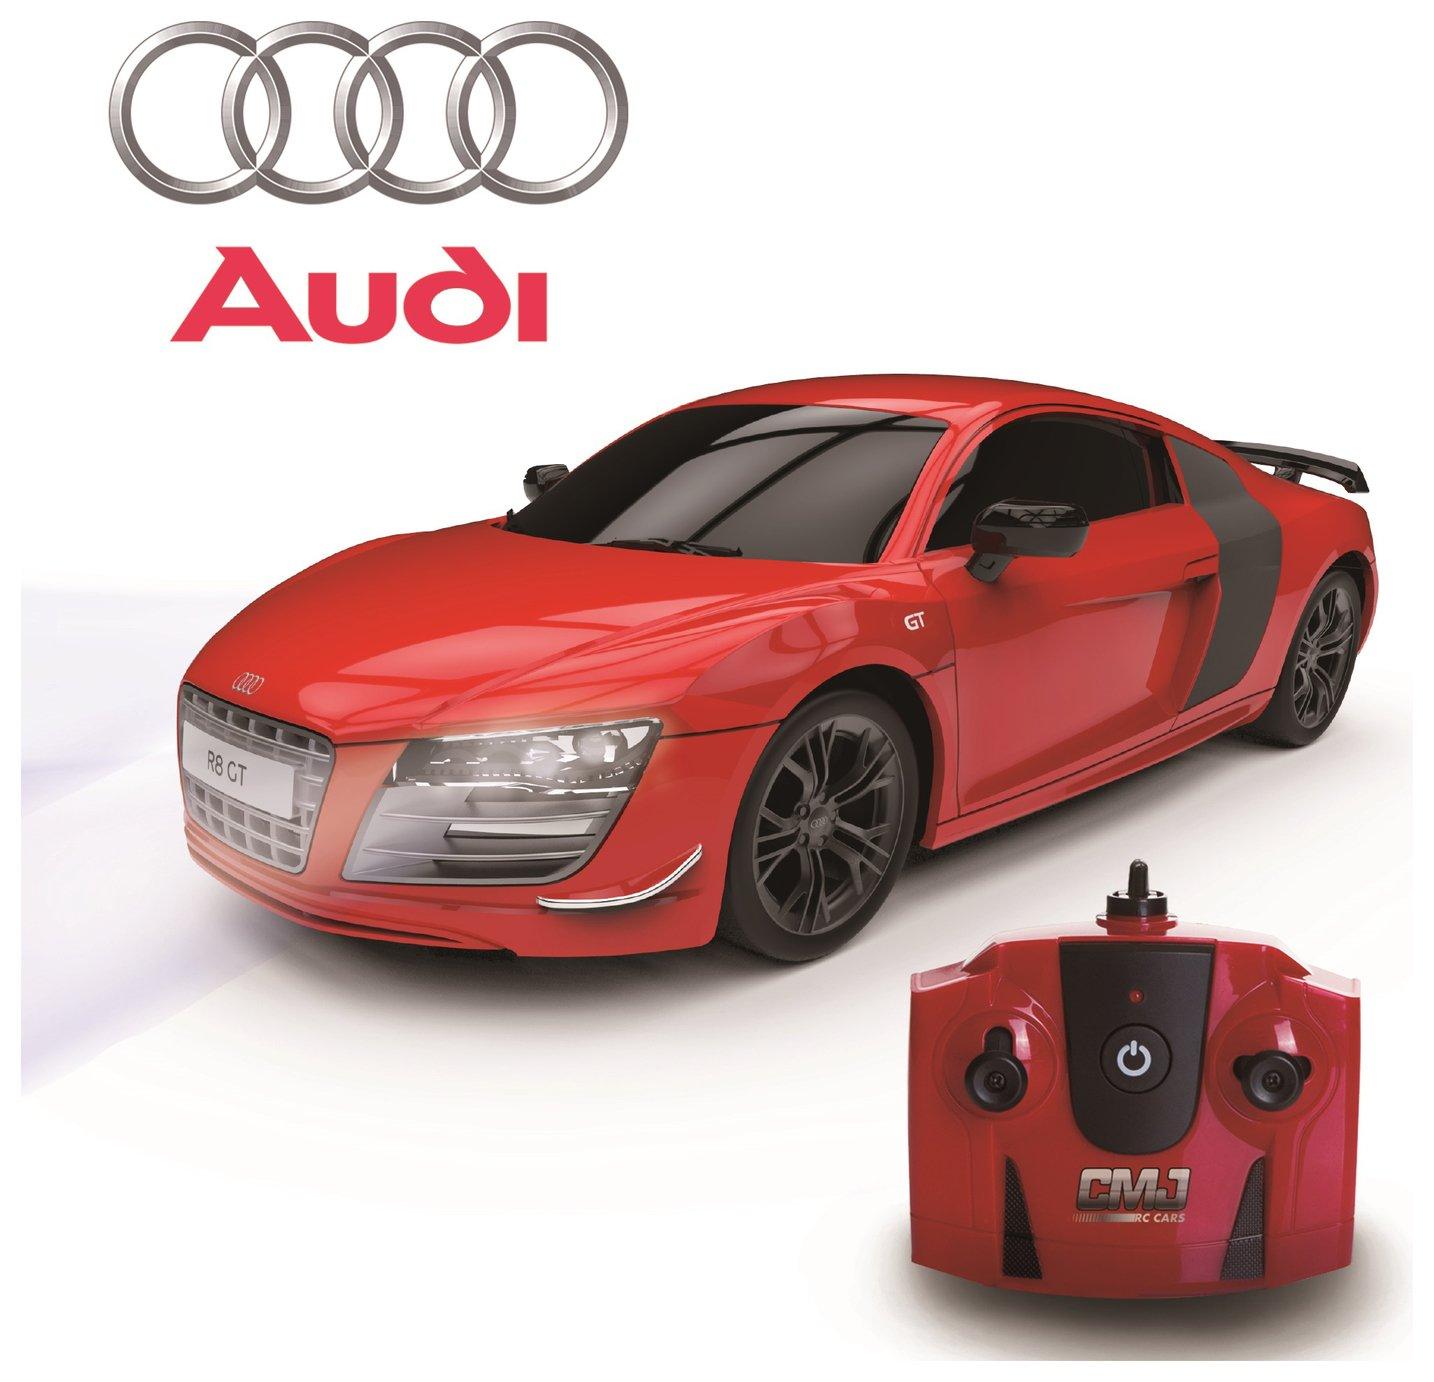 Audi R8 GT Remote Control Car 1:24 Red 2.4Ghz